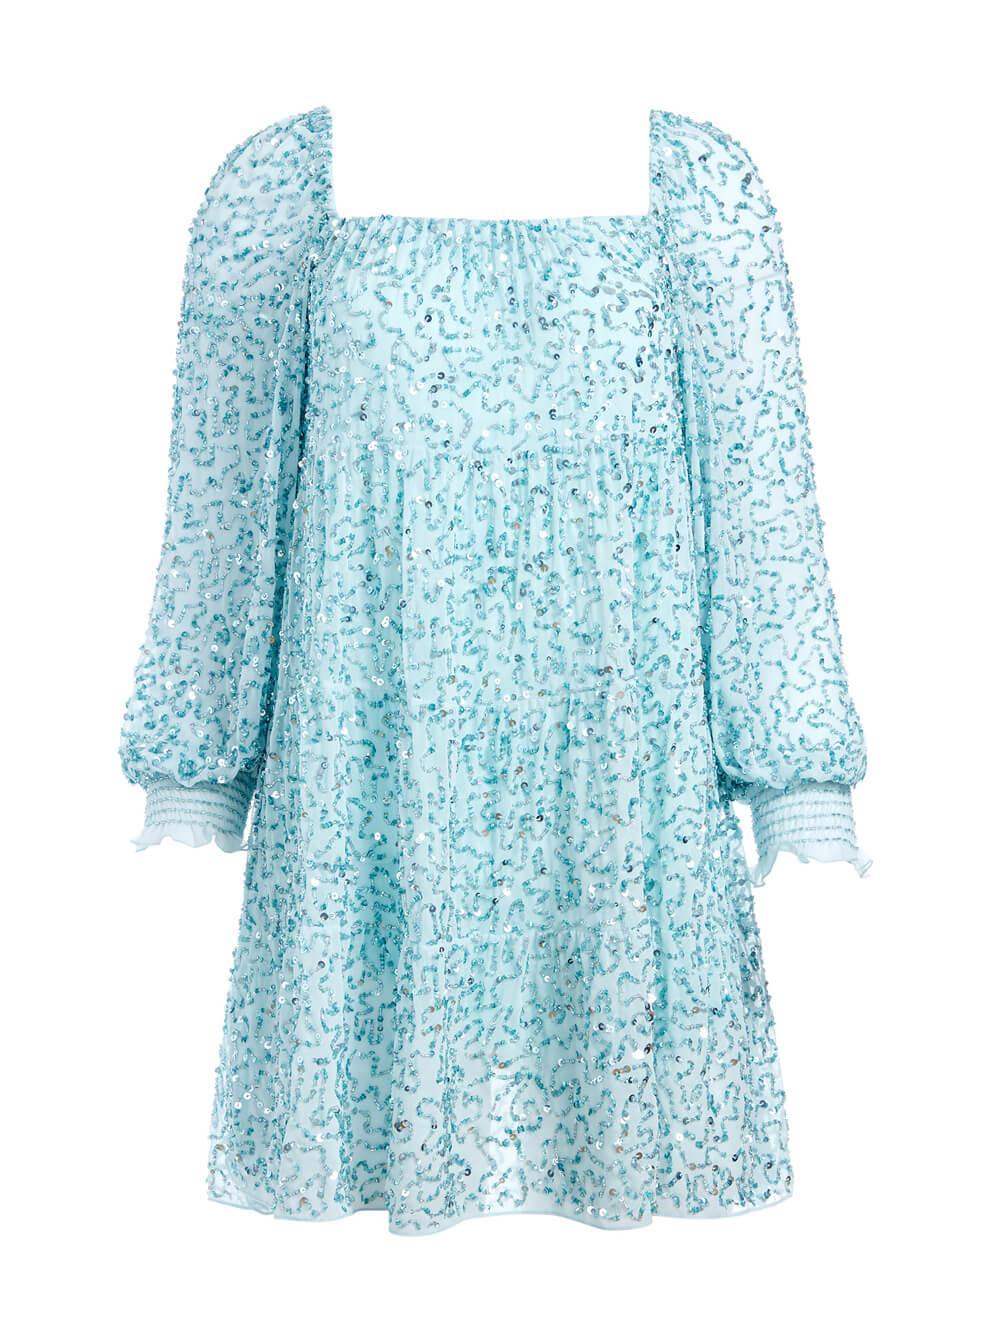 Rowen Mini Dress